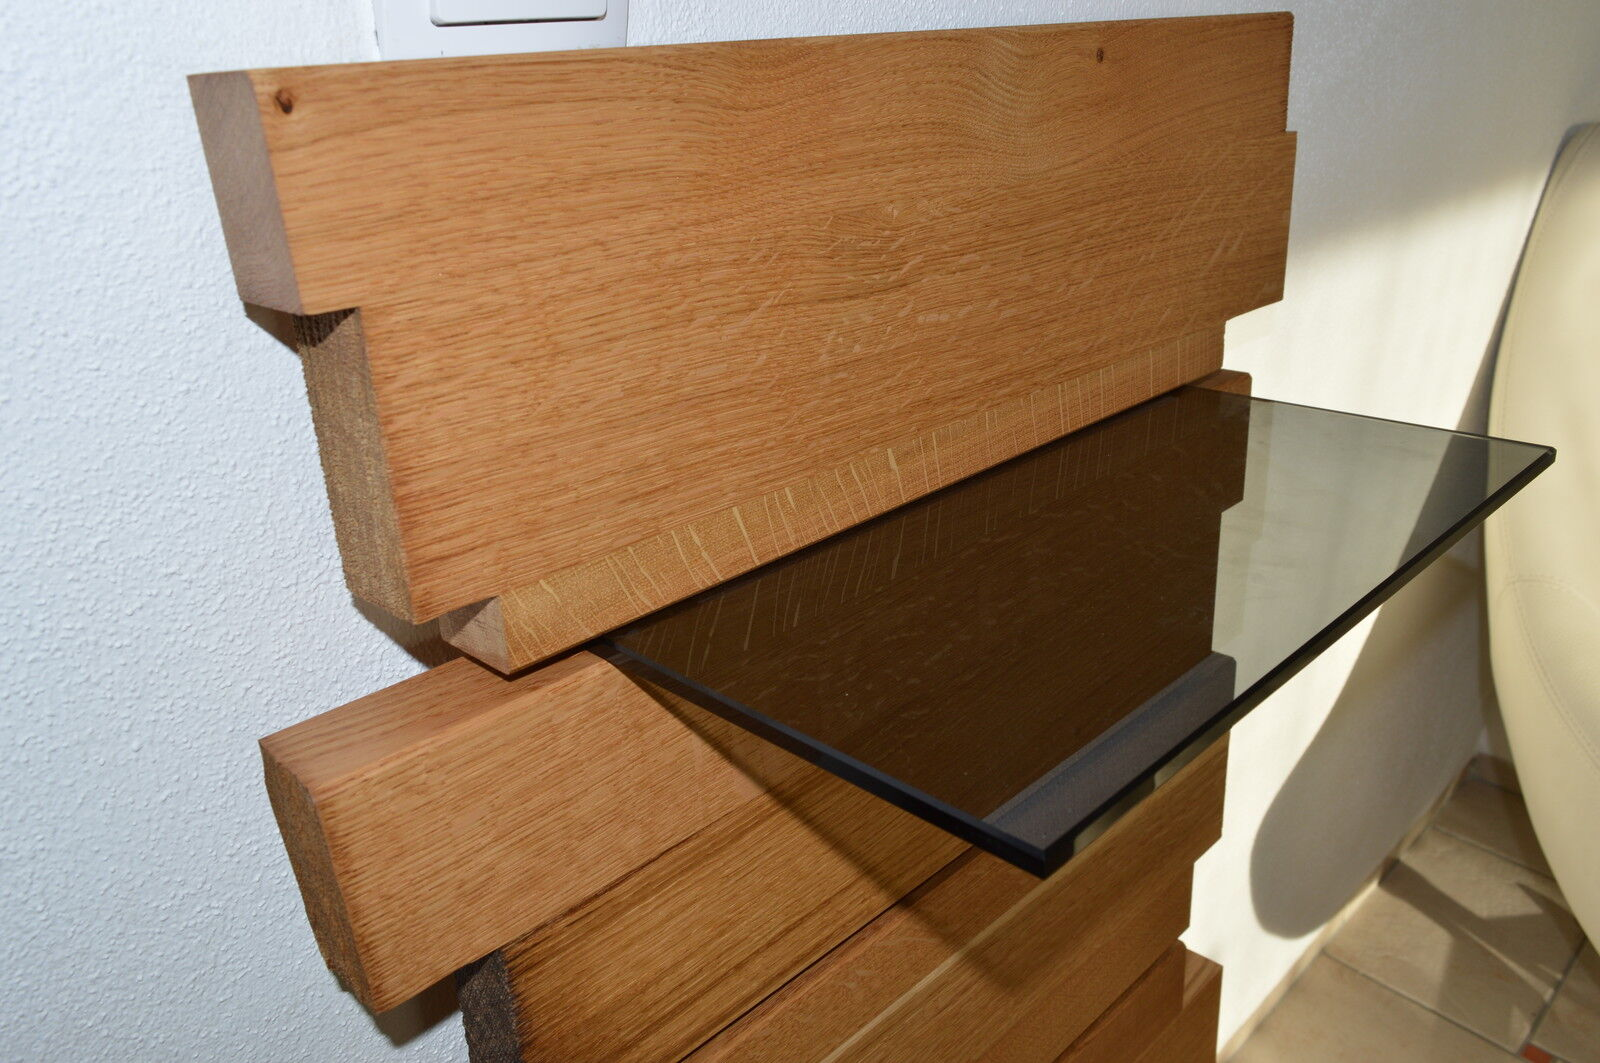 design wandboard eiche massiv holz board regal glasregal regalbrett neu eur 450 00. Black Bedroom Furniture Sets. Home Design Ideas